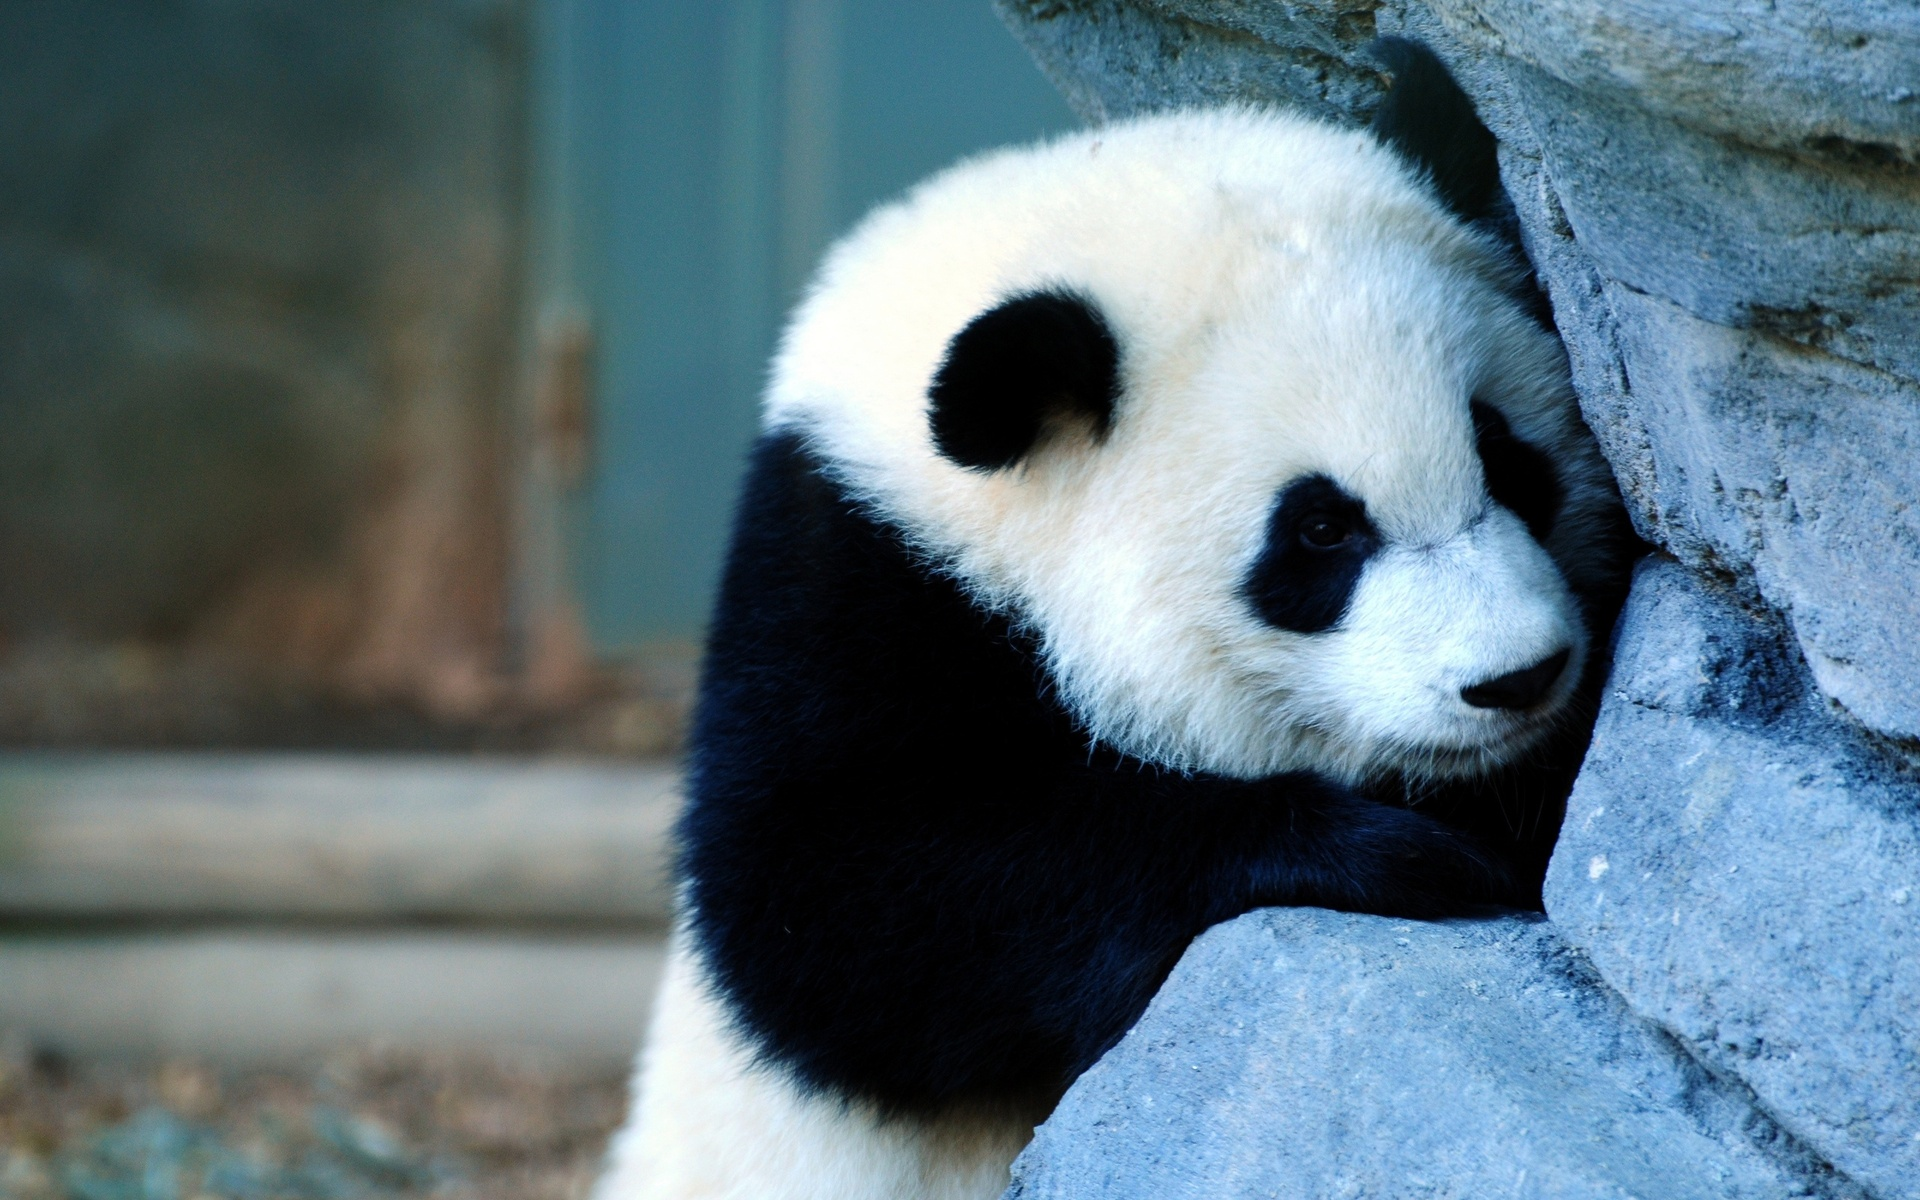 Little panda photo